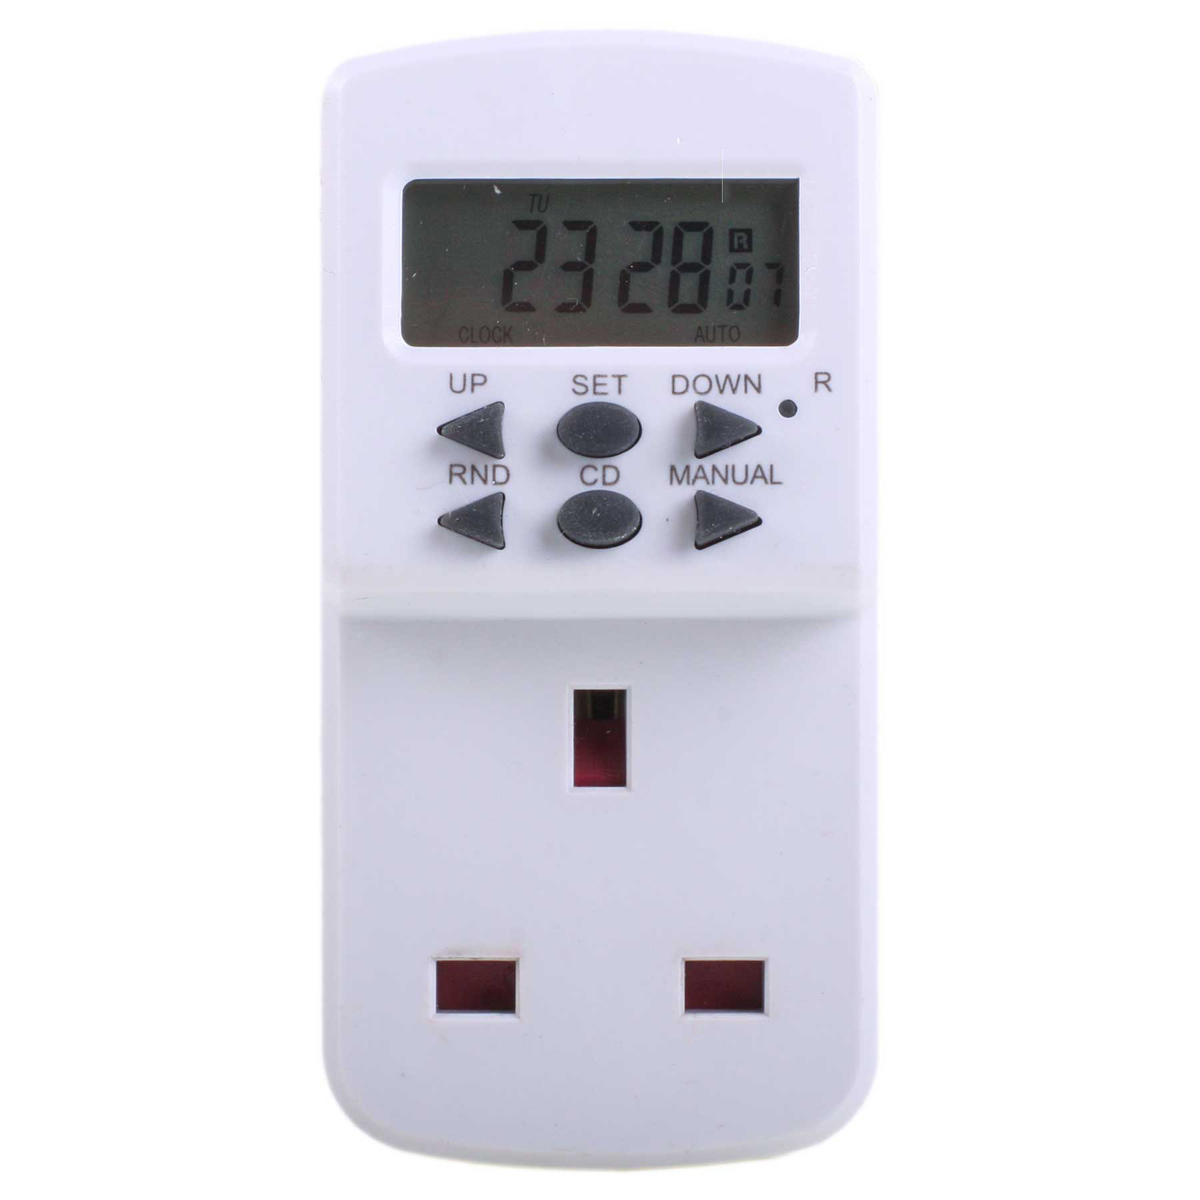 Masterplug Te7 7 Day Electronic Mains Timer White Hughes